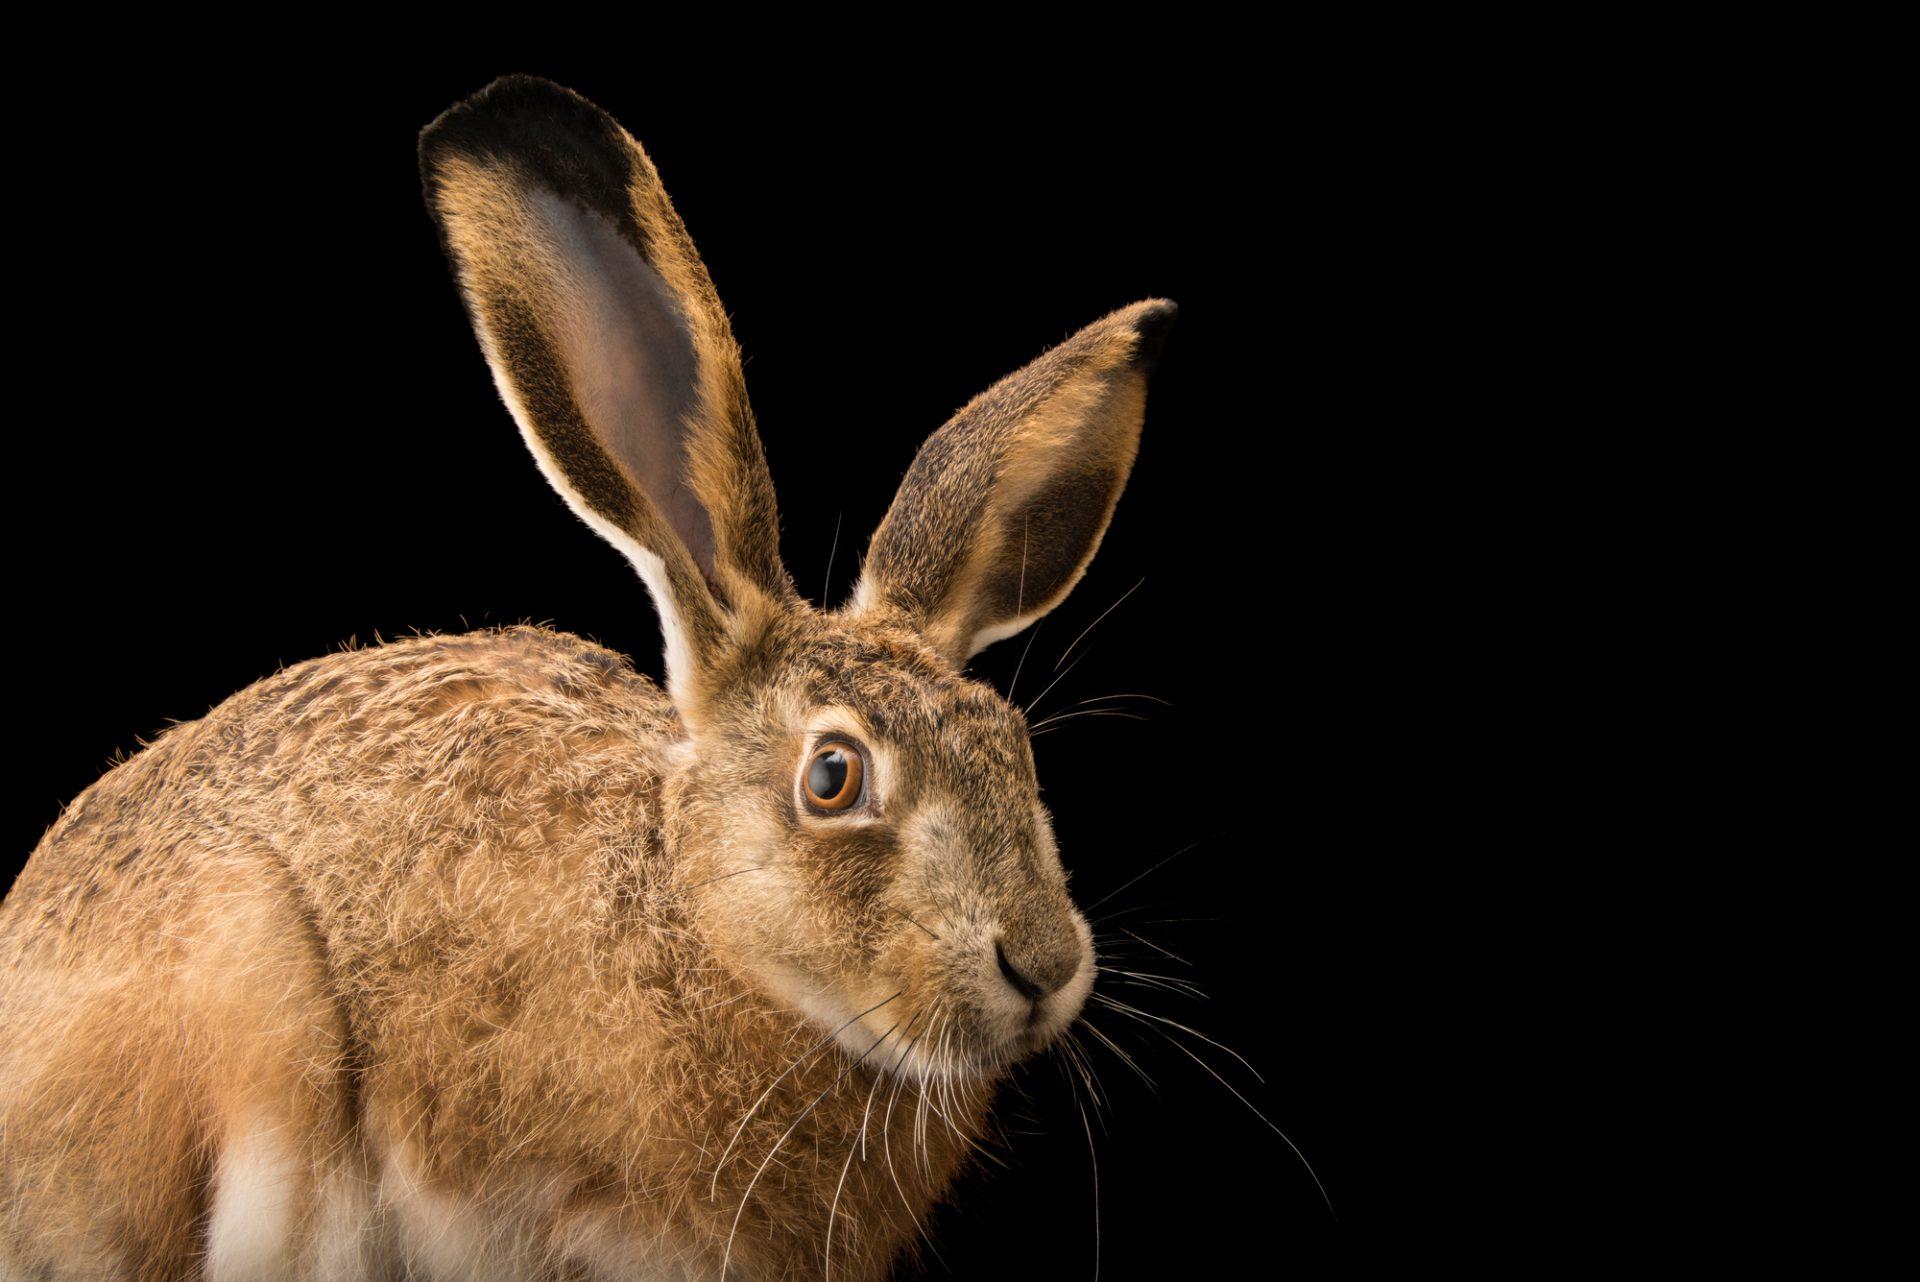 Photo: Iberian hare (Lepus granatensis granatensis) at the University of Porto in Portugal